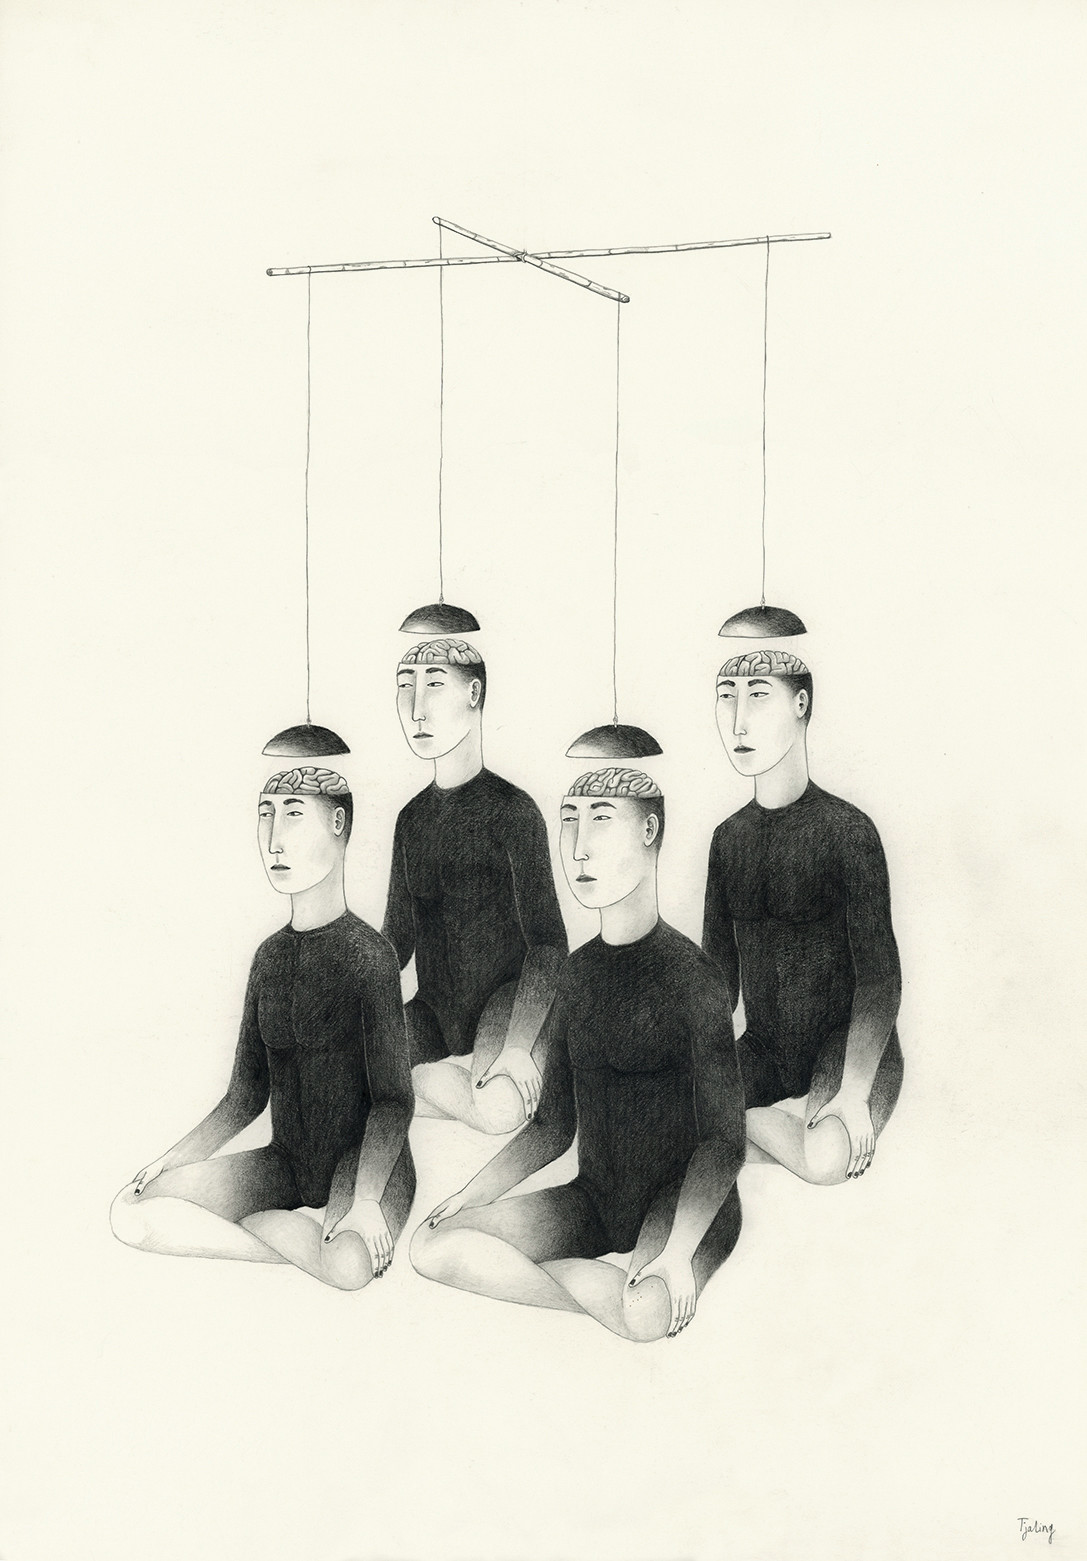 Collective Unconscious (2015)